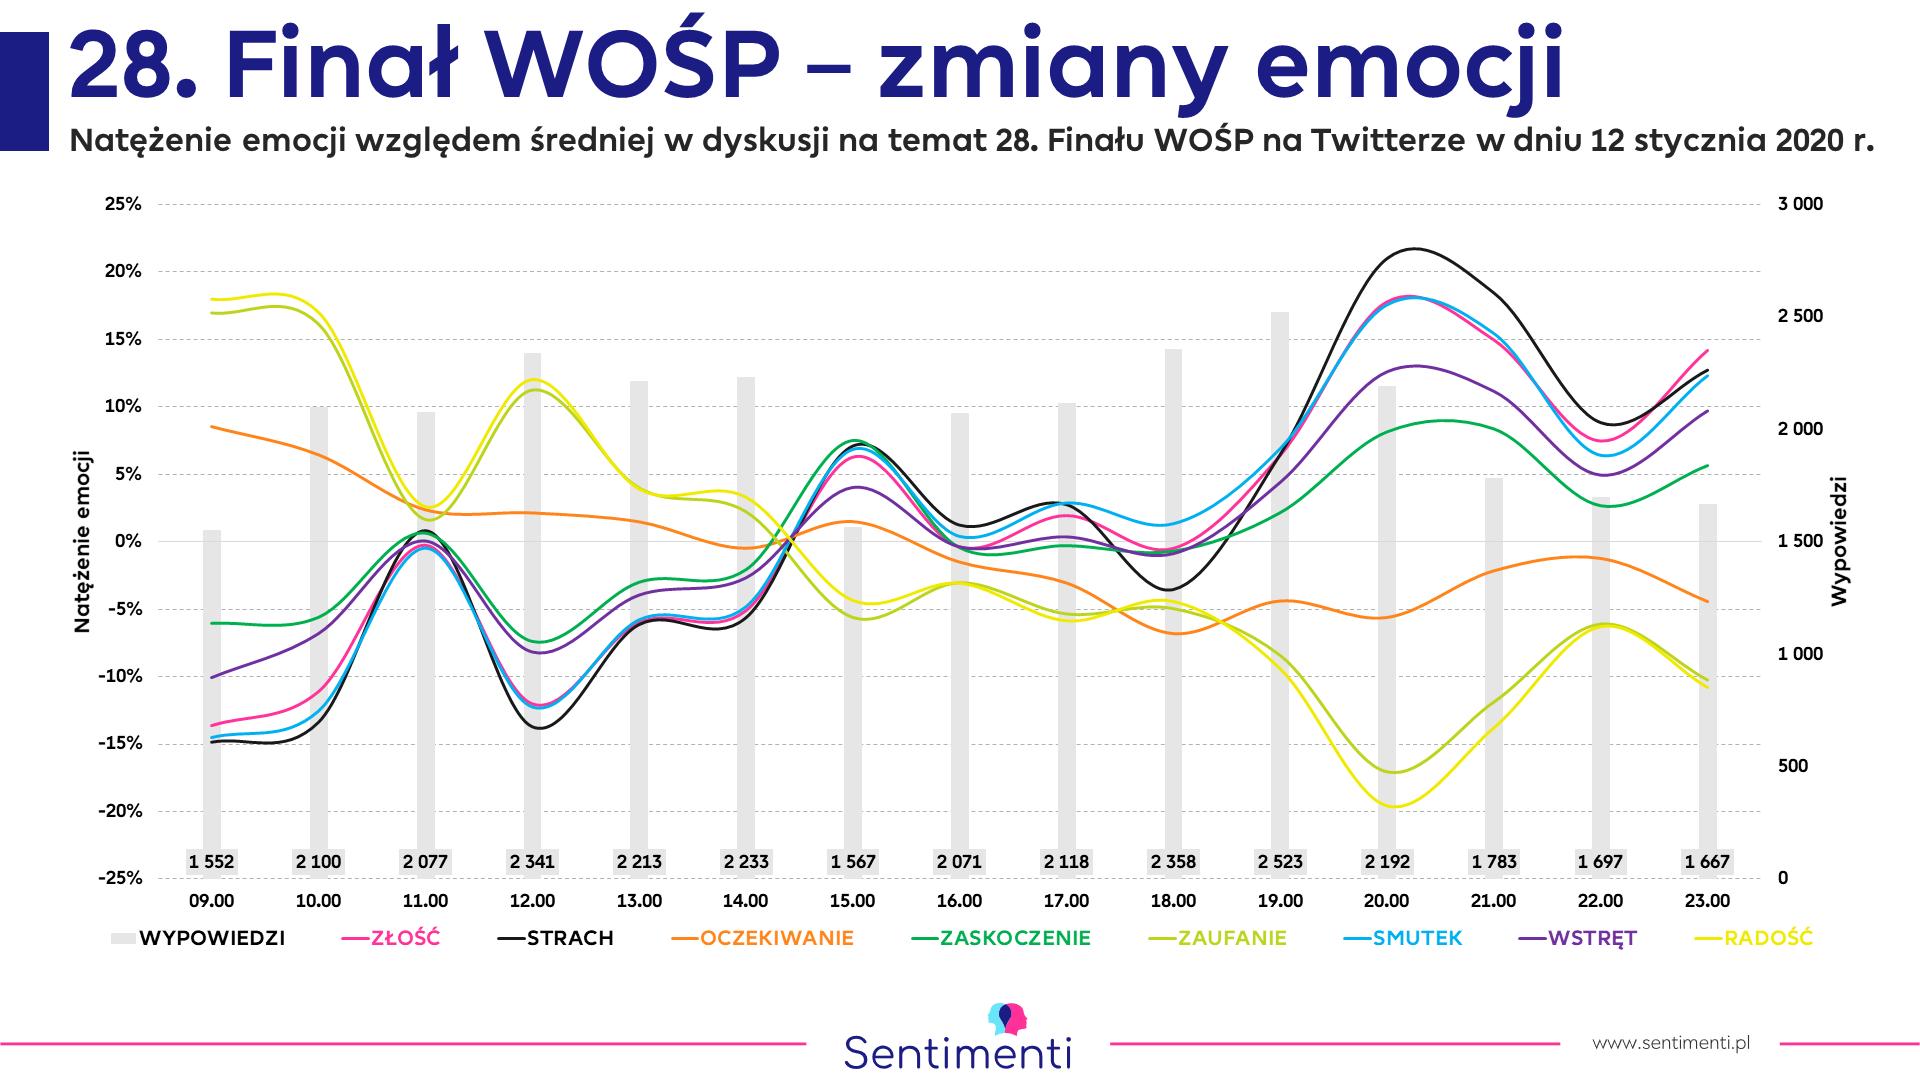 monitoring mediów social listening nasłuch social media jakie są emocje